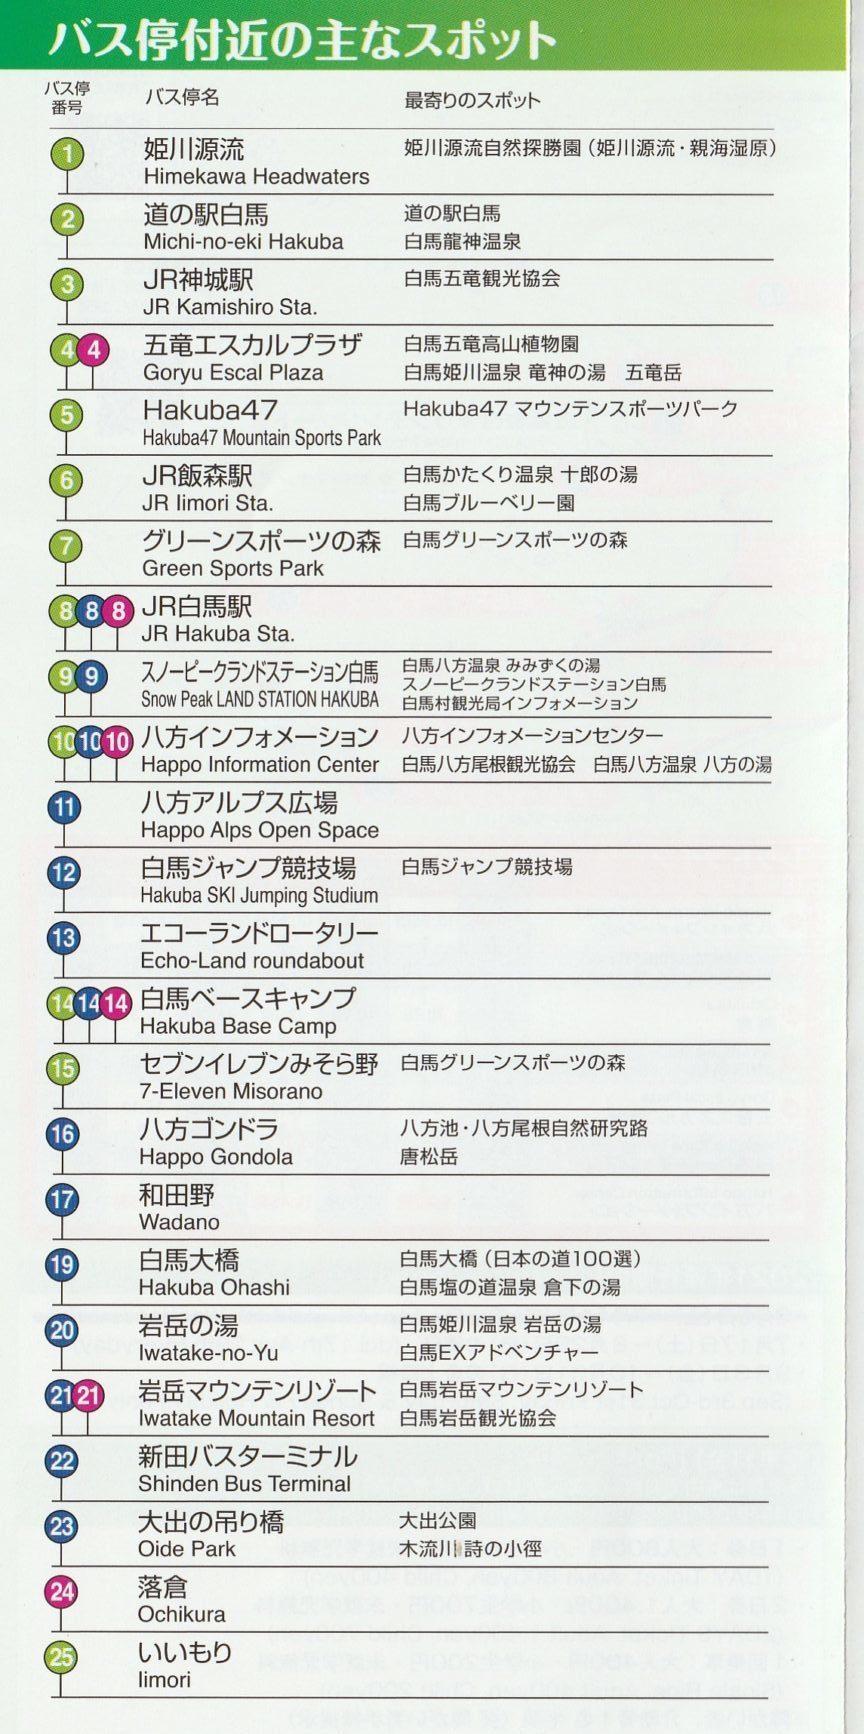 2021 Hakuba Summer Shuttle Timetable